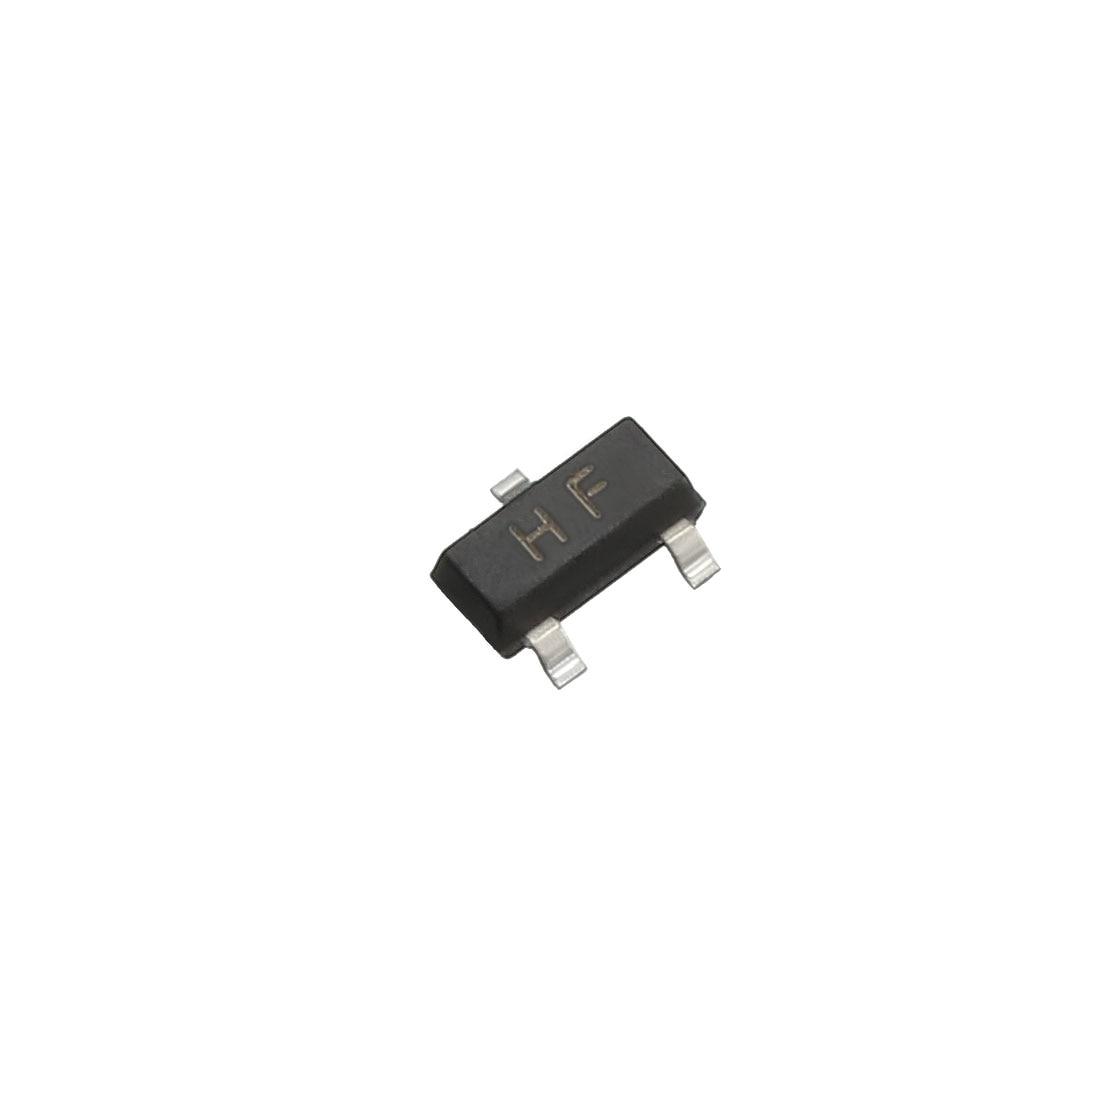 Uxcell Transistor NPN 300V 300mA 350mW Surface Mount SOT-23 C1815-HF 200pcs